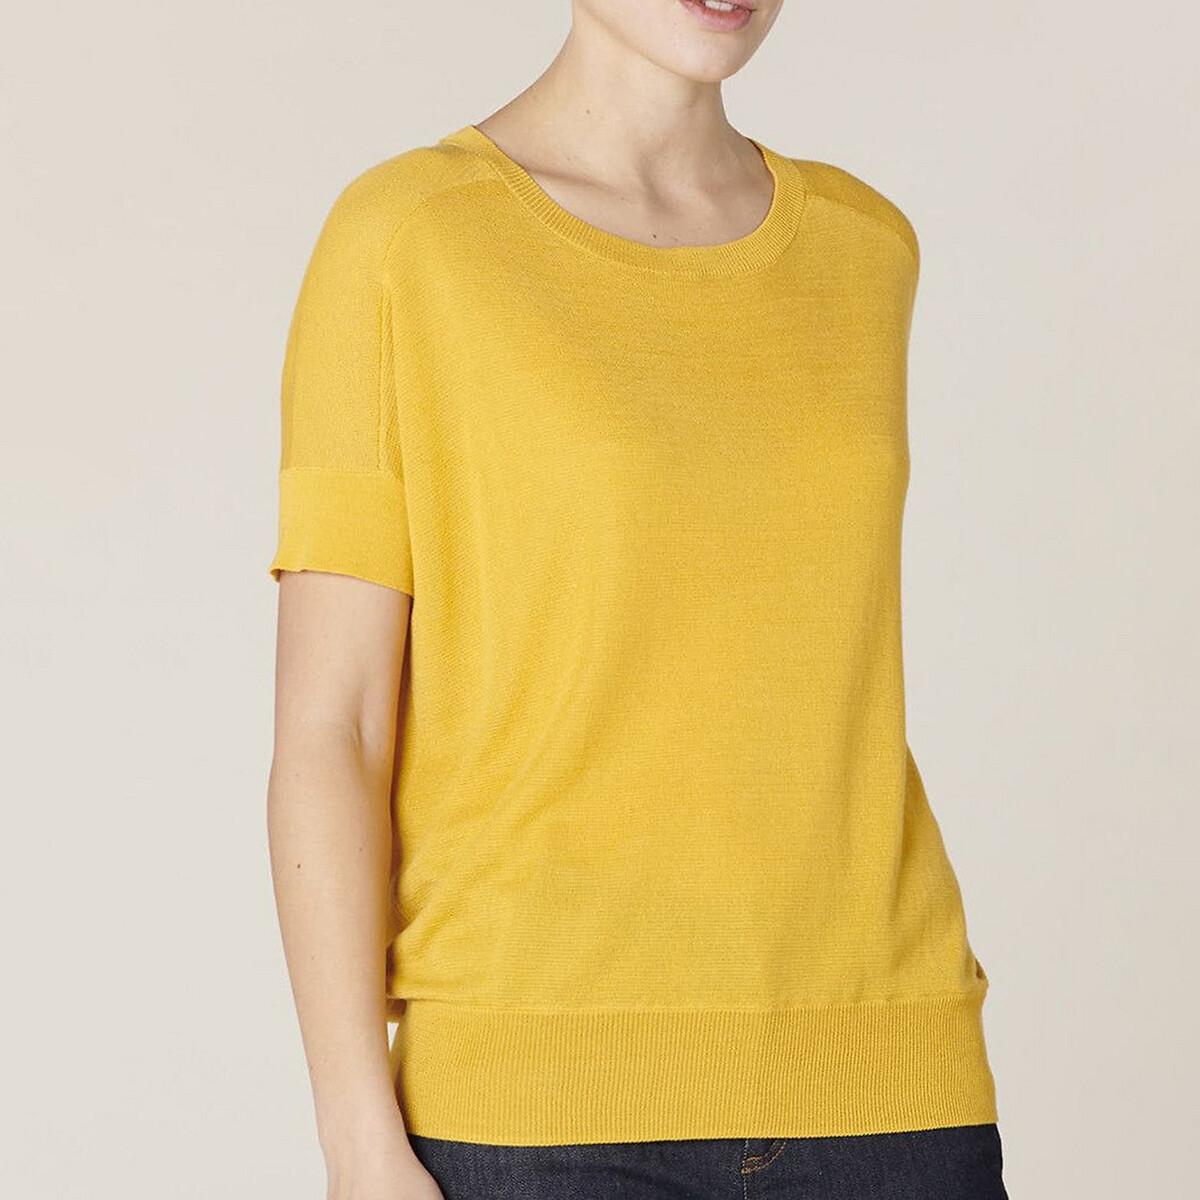 Пуловер La Redoute С круглым вырезом из тонкого трикотажа FLAURINE 2(M) желтый